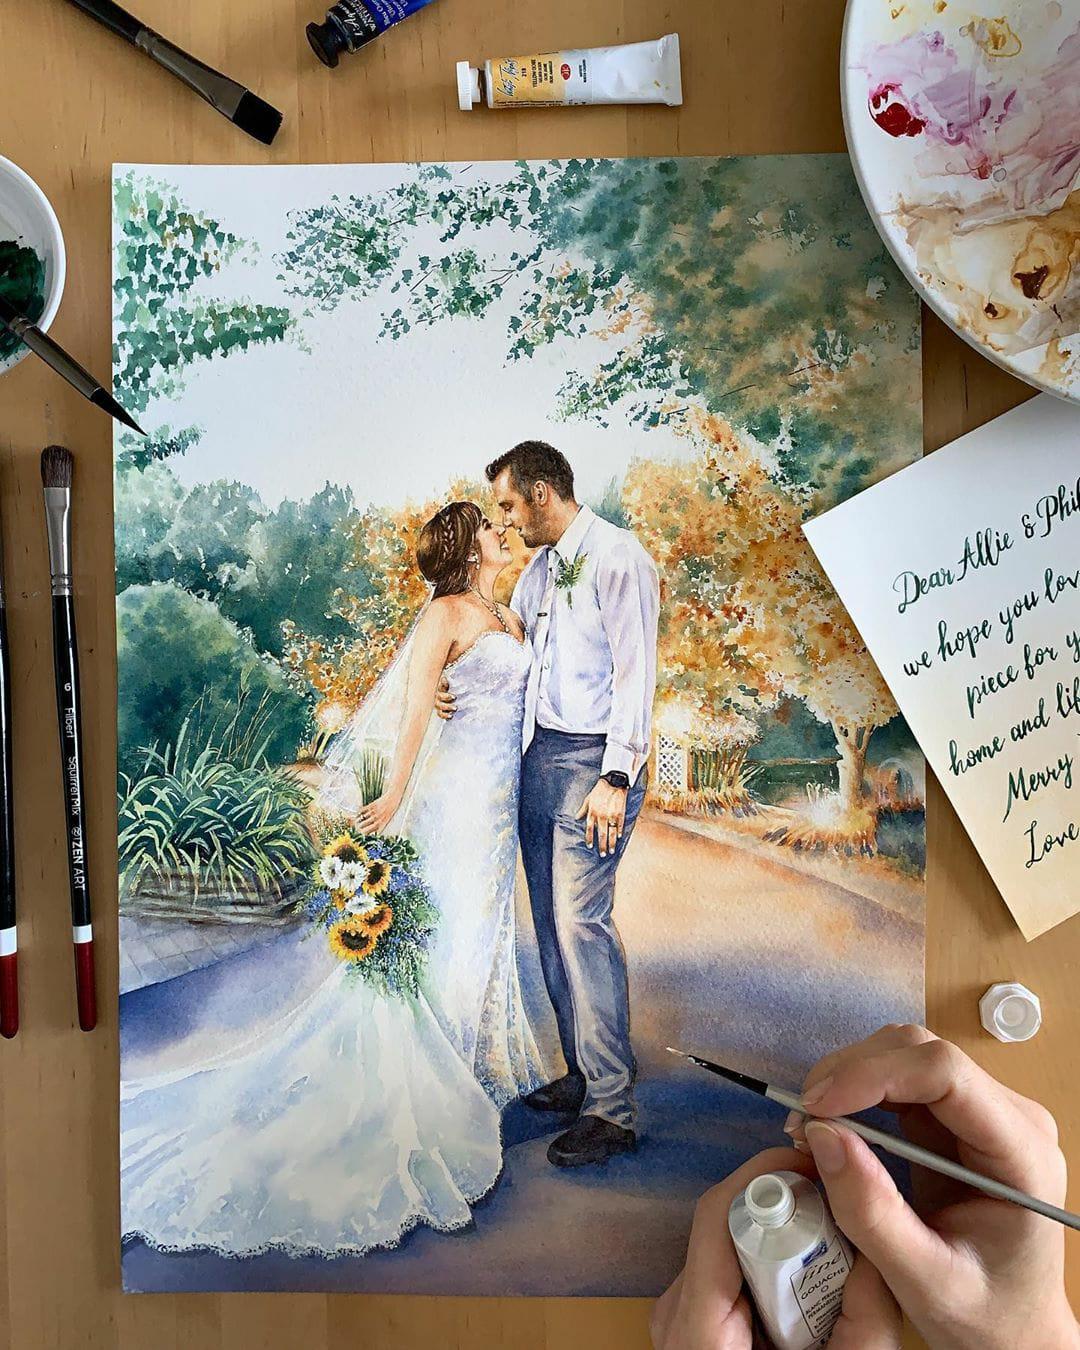 Matrimoni in Italia: oggi la ripartenza, file rouge del vostro matrimonio, primavera, file rouge matrimonio primavera, l'aura bianca wedding planner, sposincampania, sposi campania, sposi in campania, matrimoni campania, matrimonio campania